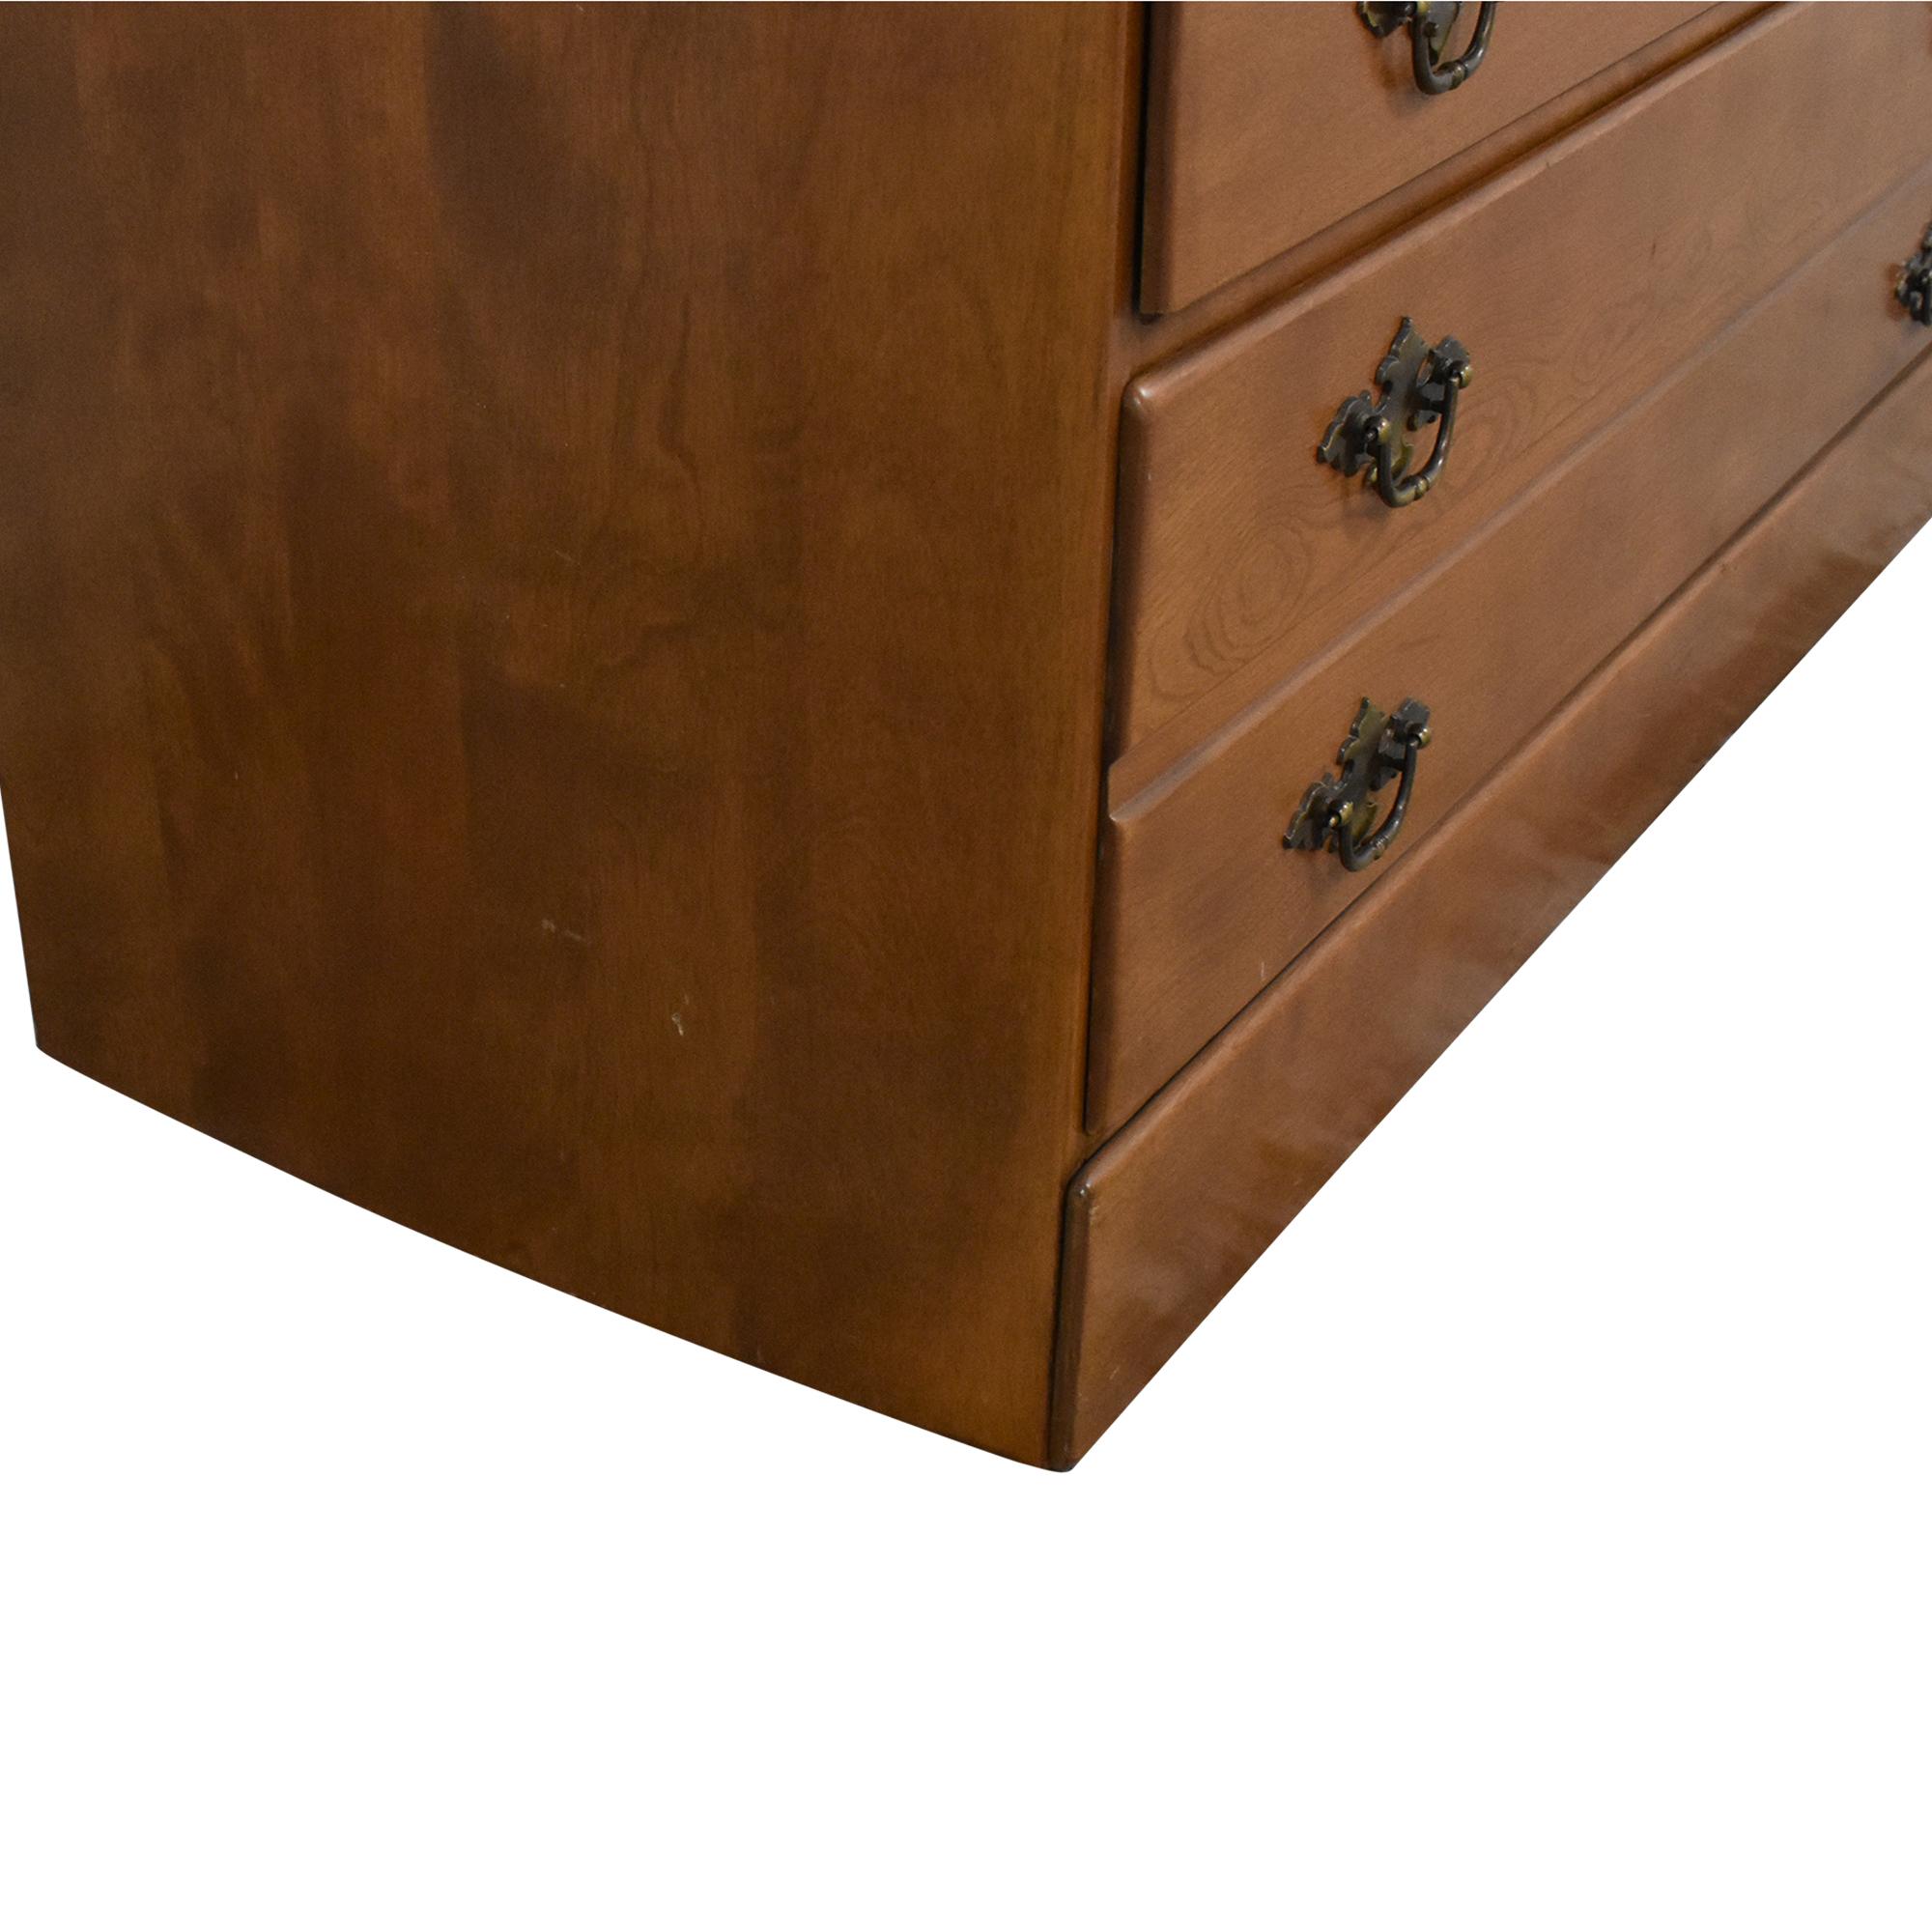 buy Ethan Allen Baumritter Three Drawer Chest Ethan Allen Dressers